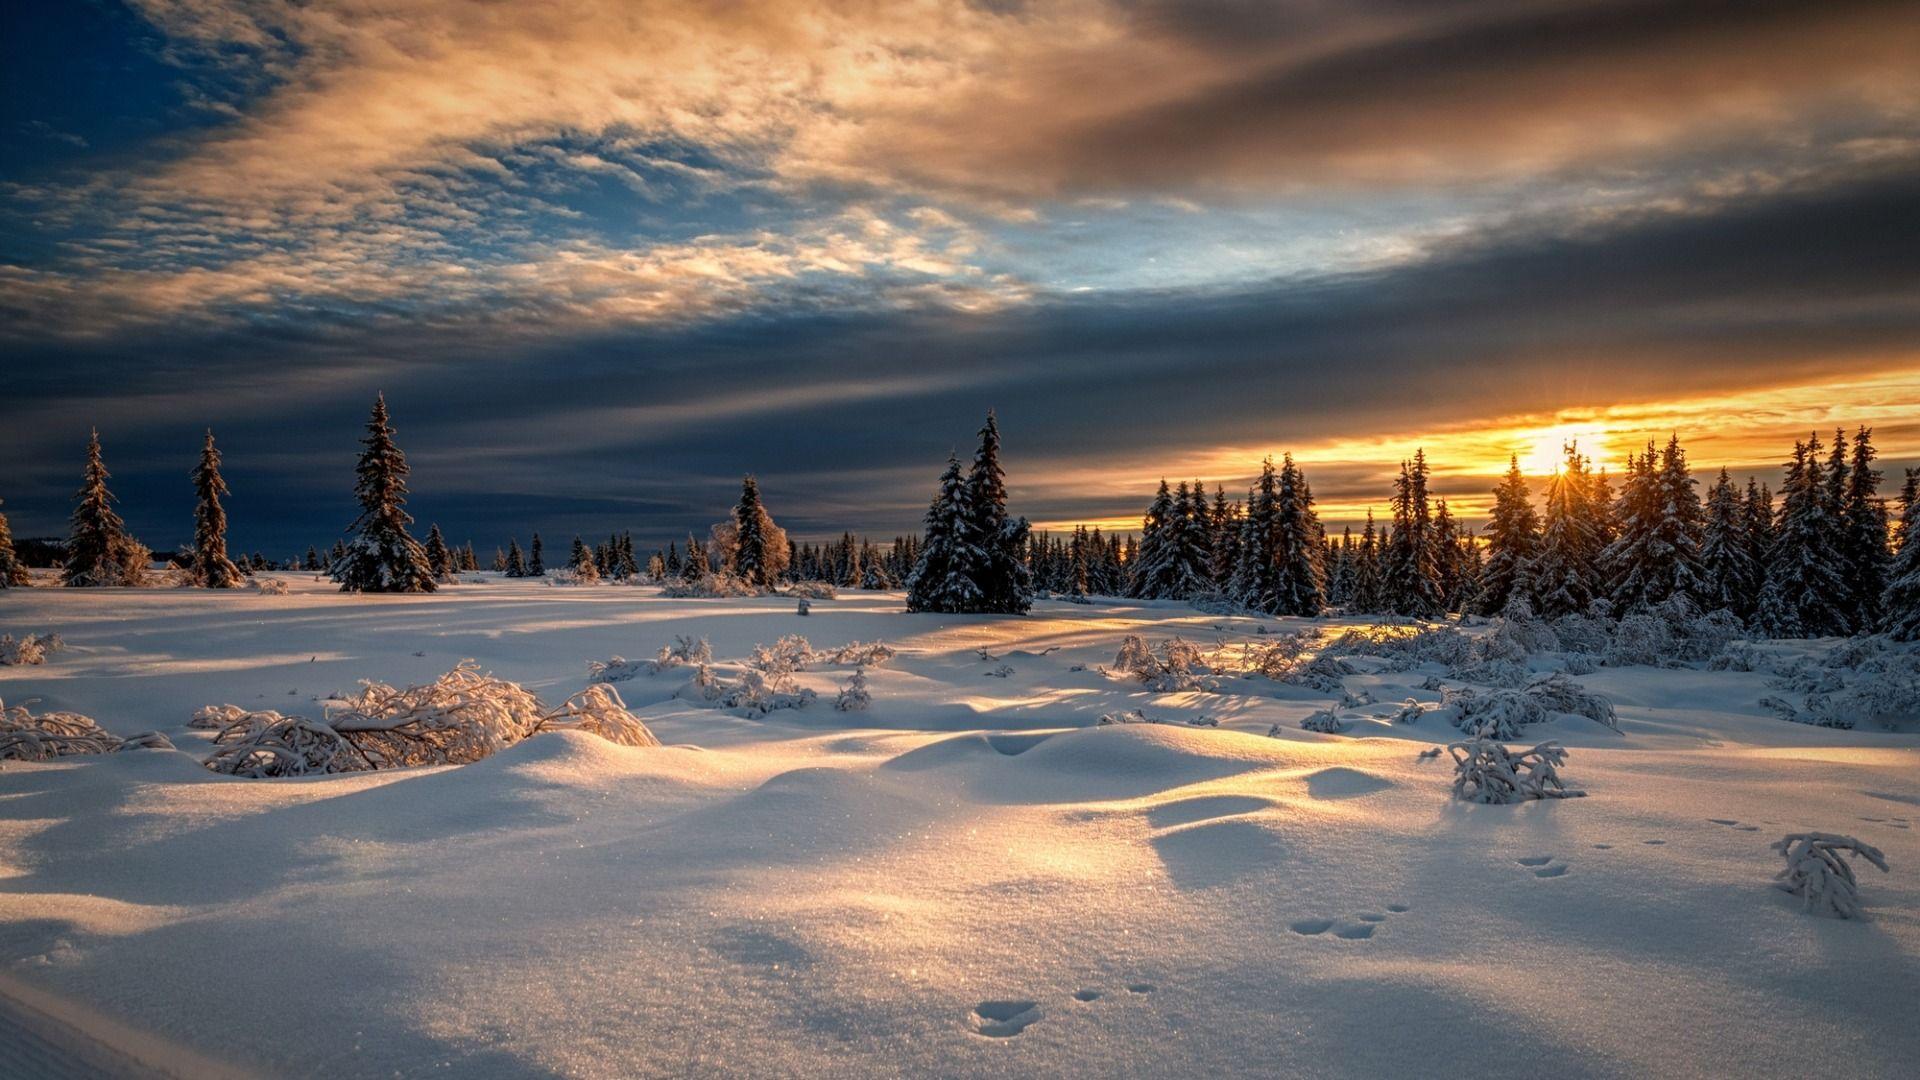 Free Winter Night Winter Images